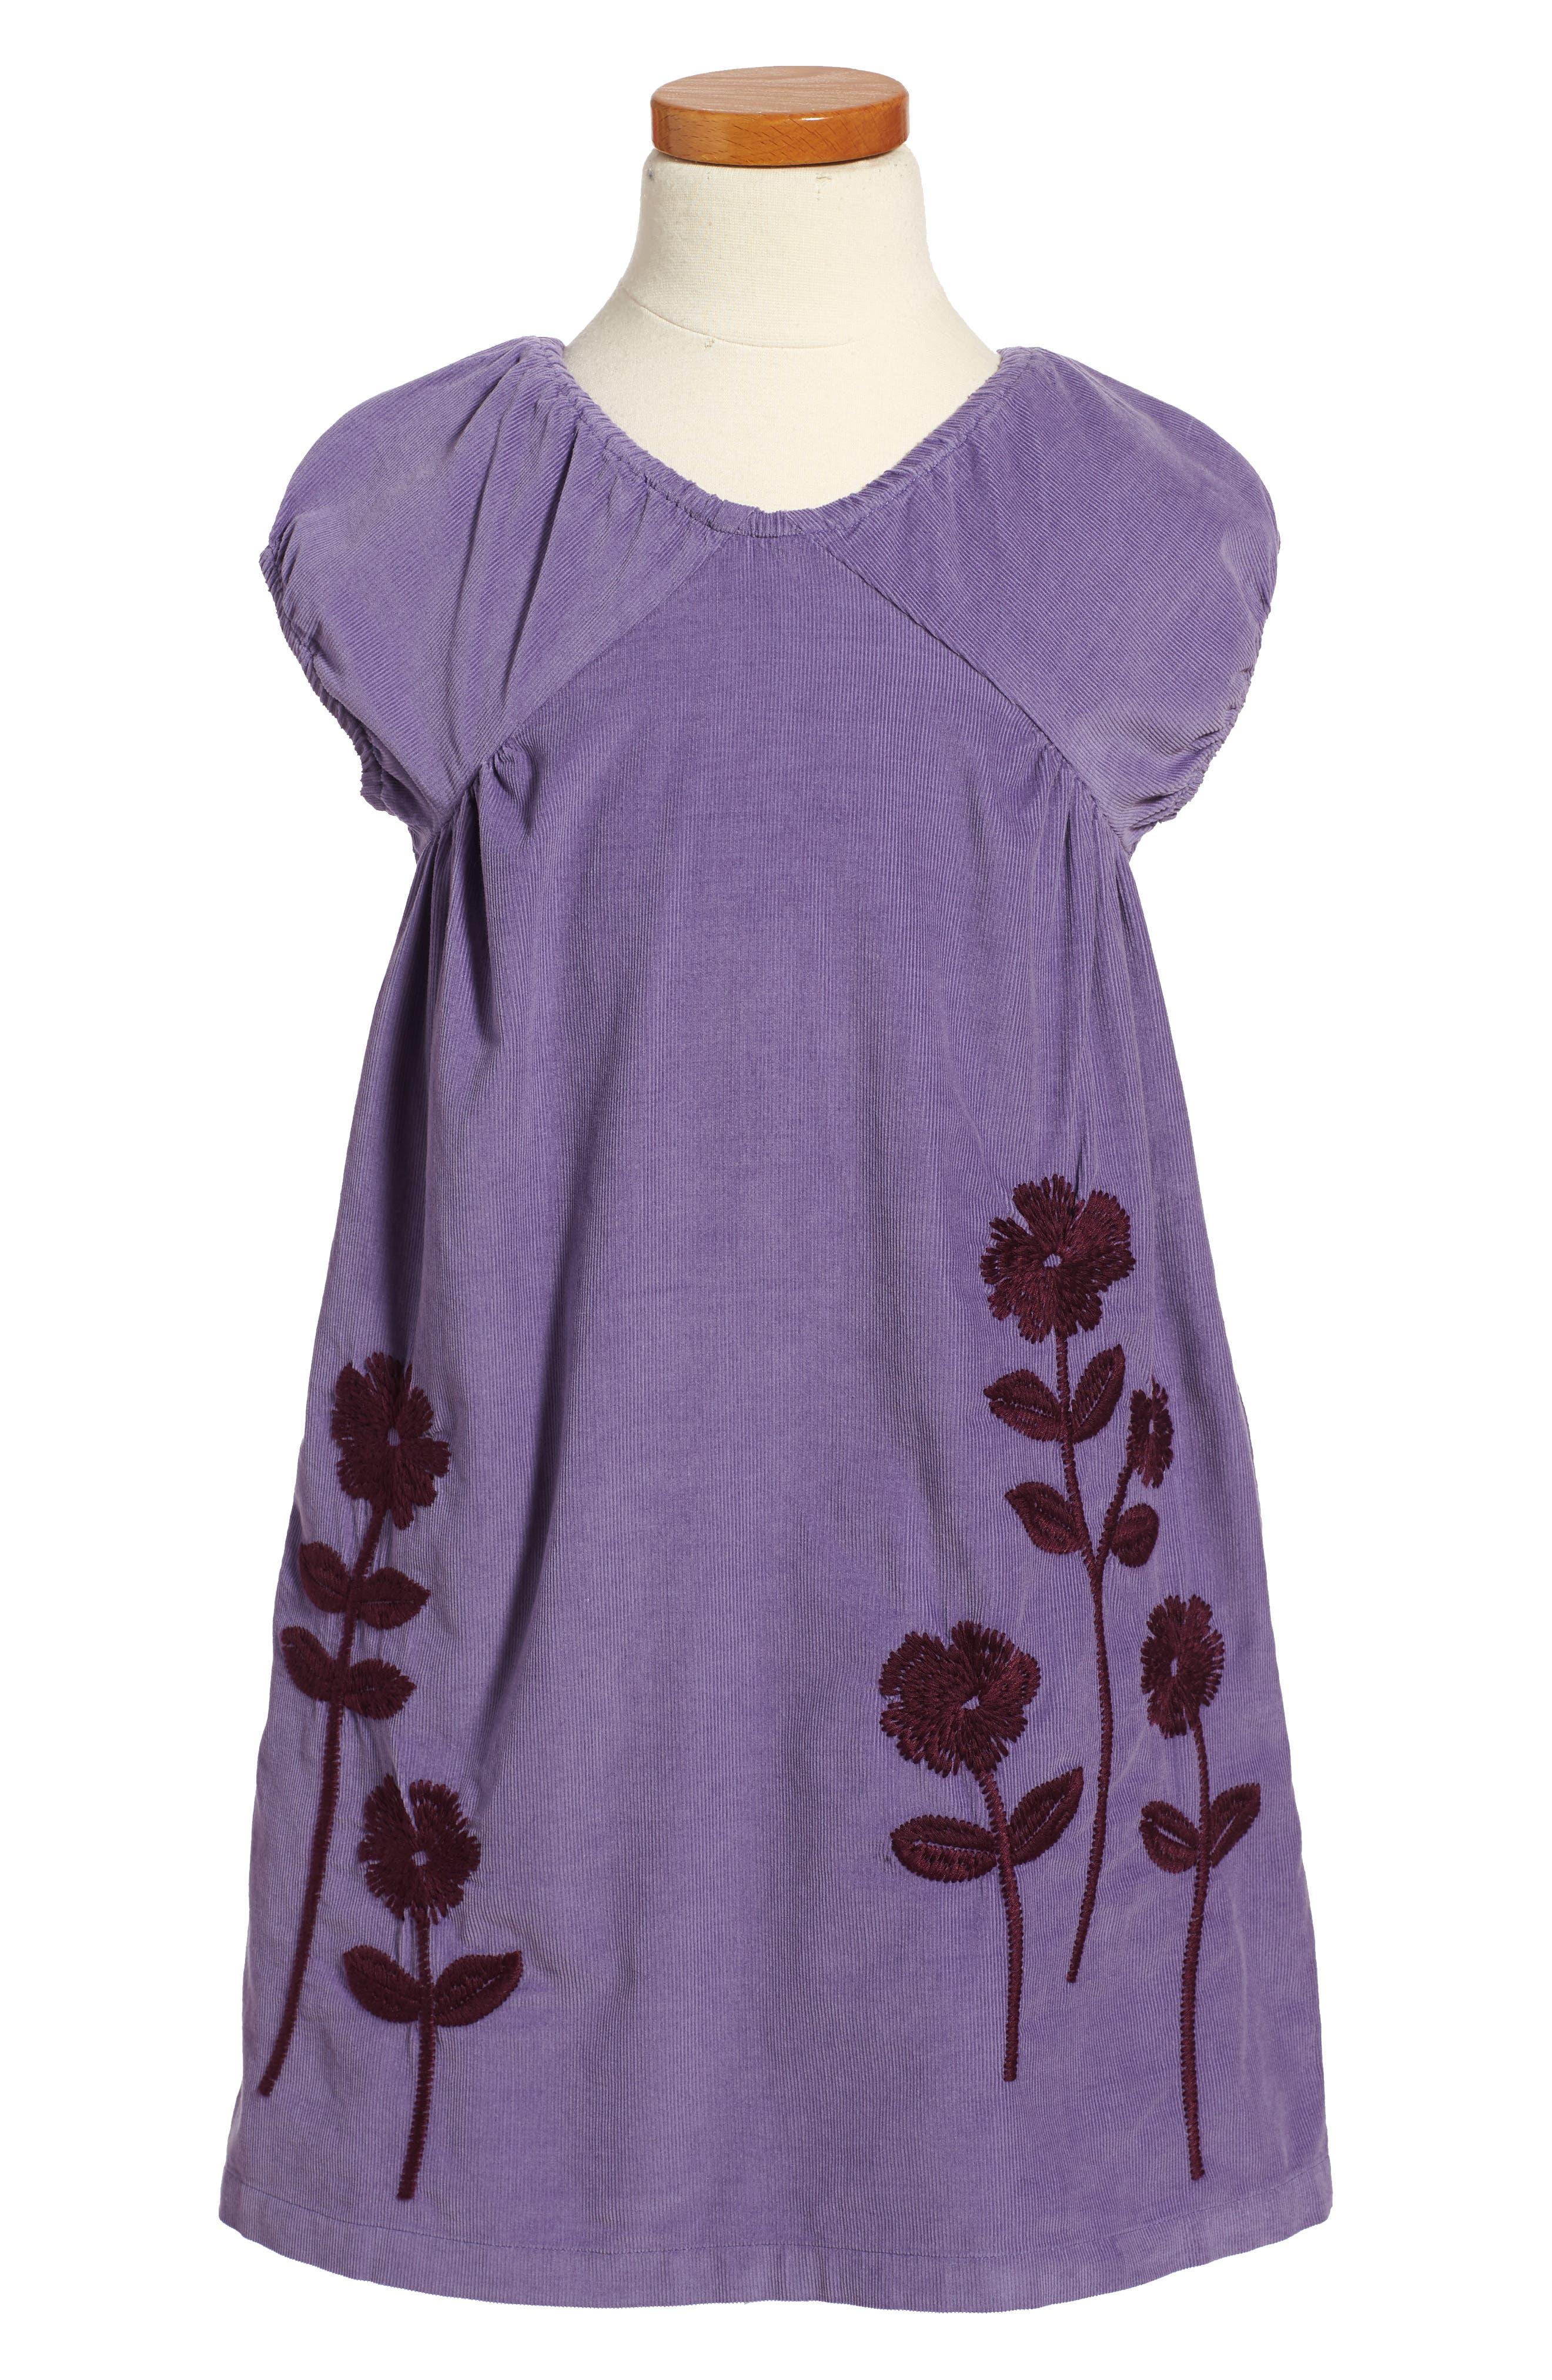 Main Image - Tea Collection Cullodena Corduroy Dress (Toddler Girls, Little Girls & Big Girls)